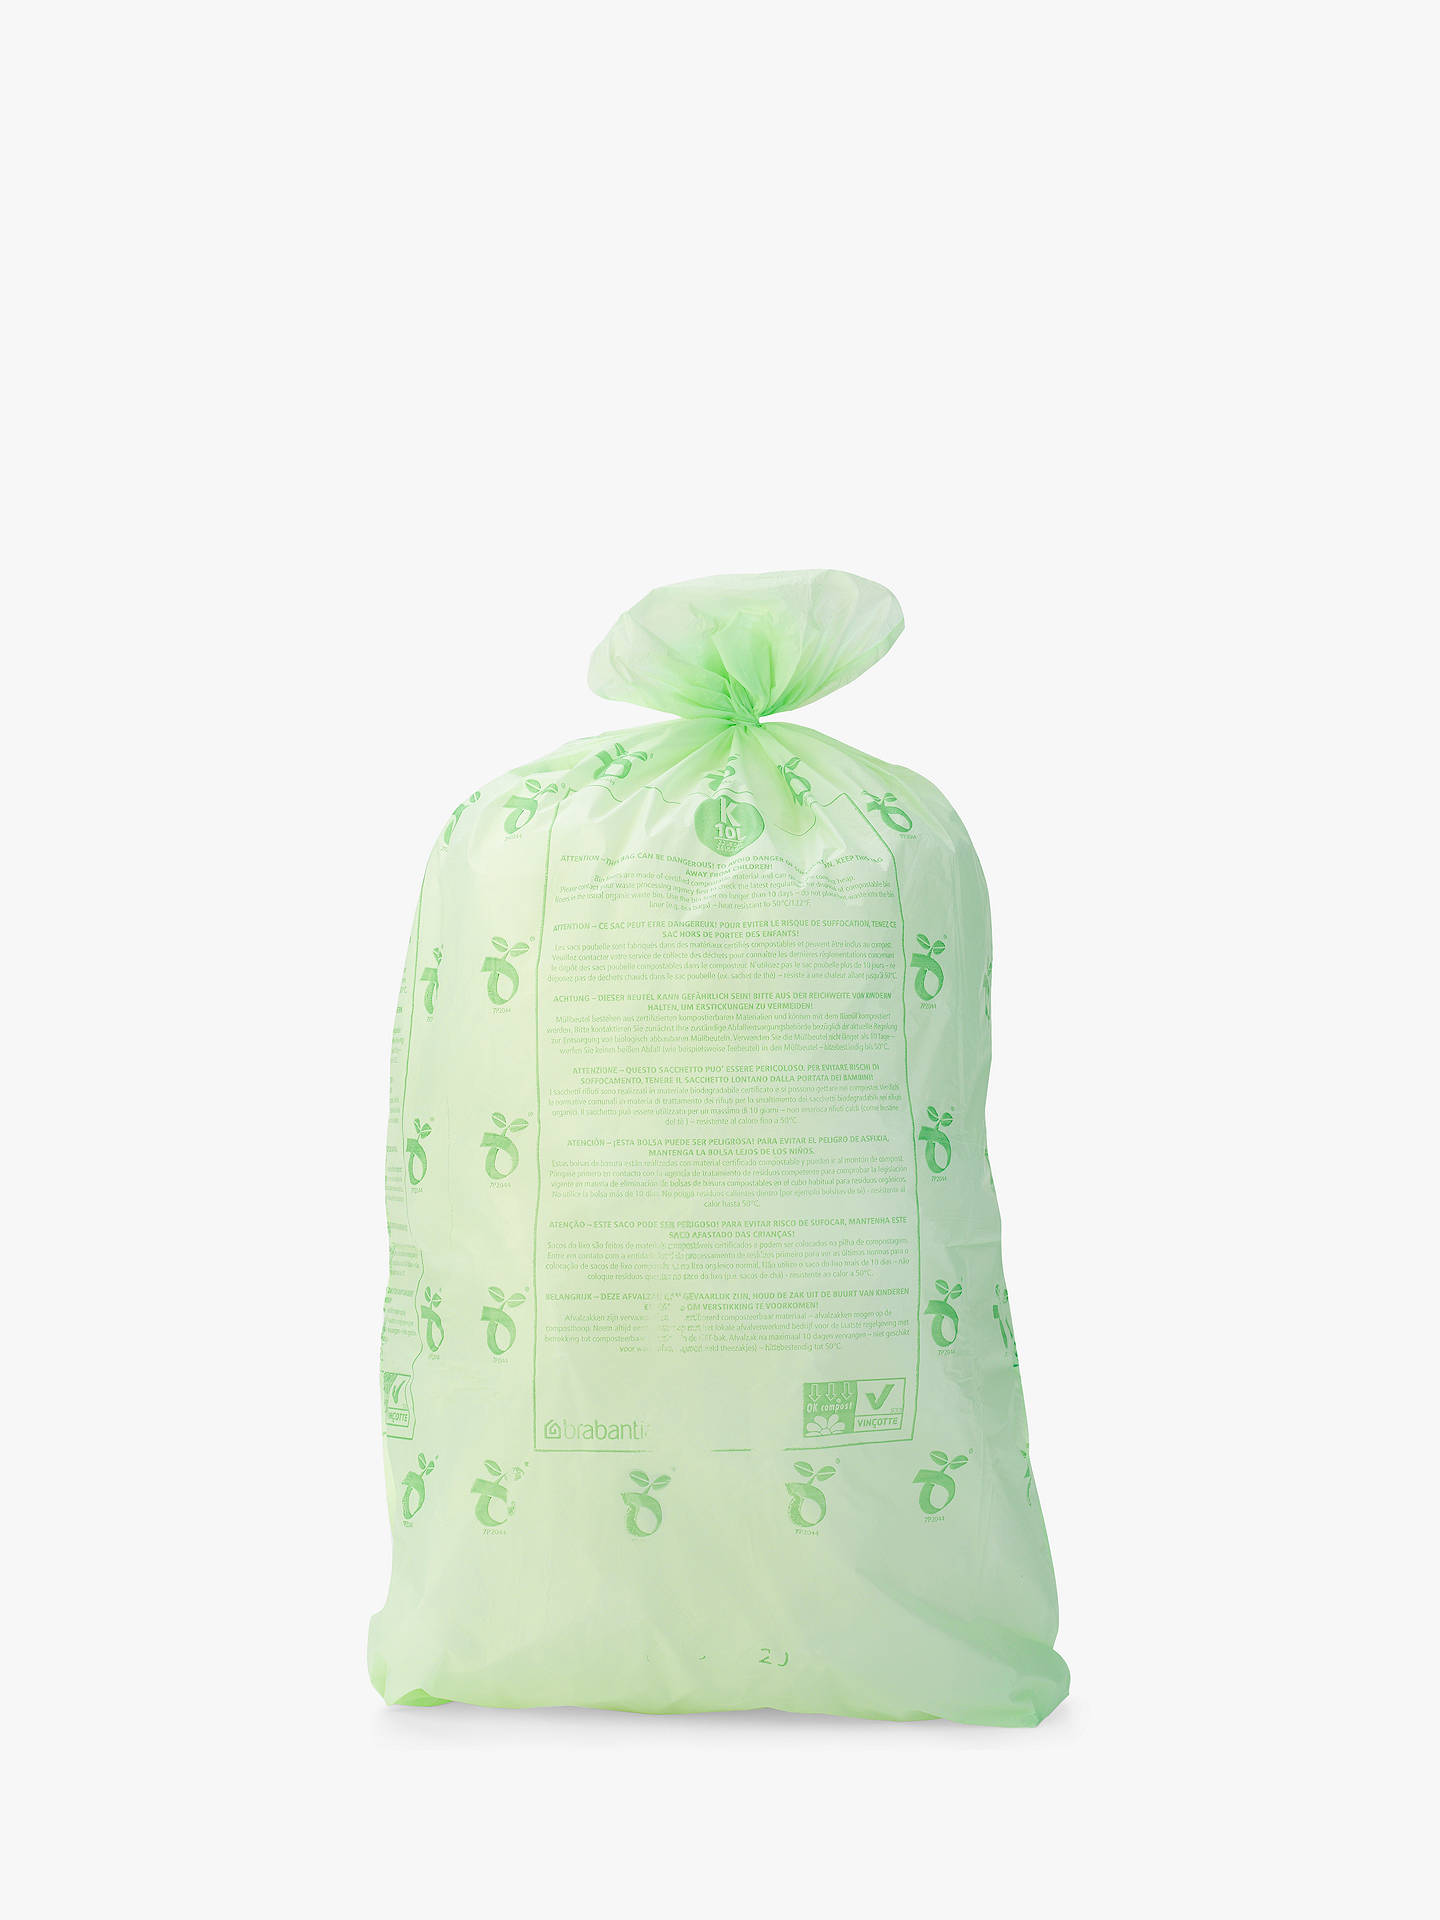 Buybrabantia Perfectfit Bin Liner Size X 12l 20 Bags Online At Johnlewis